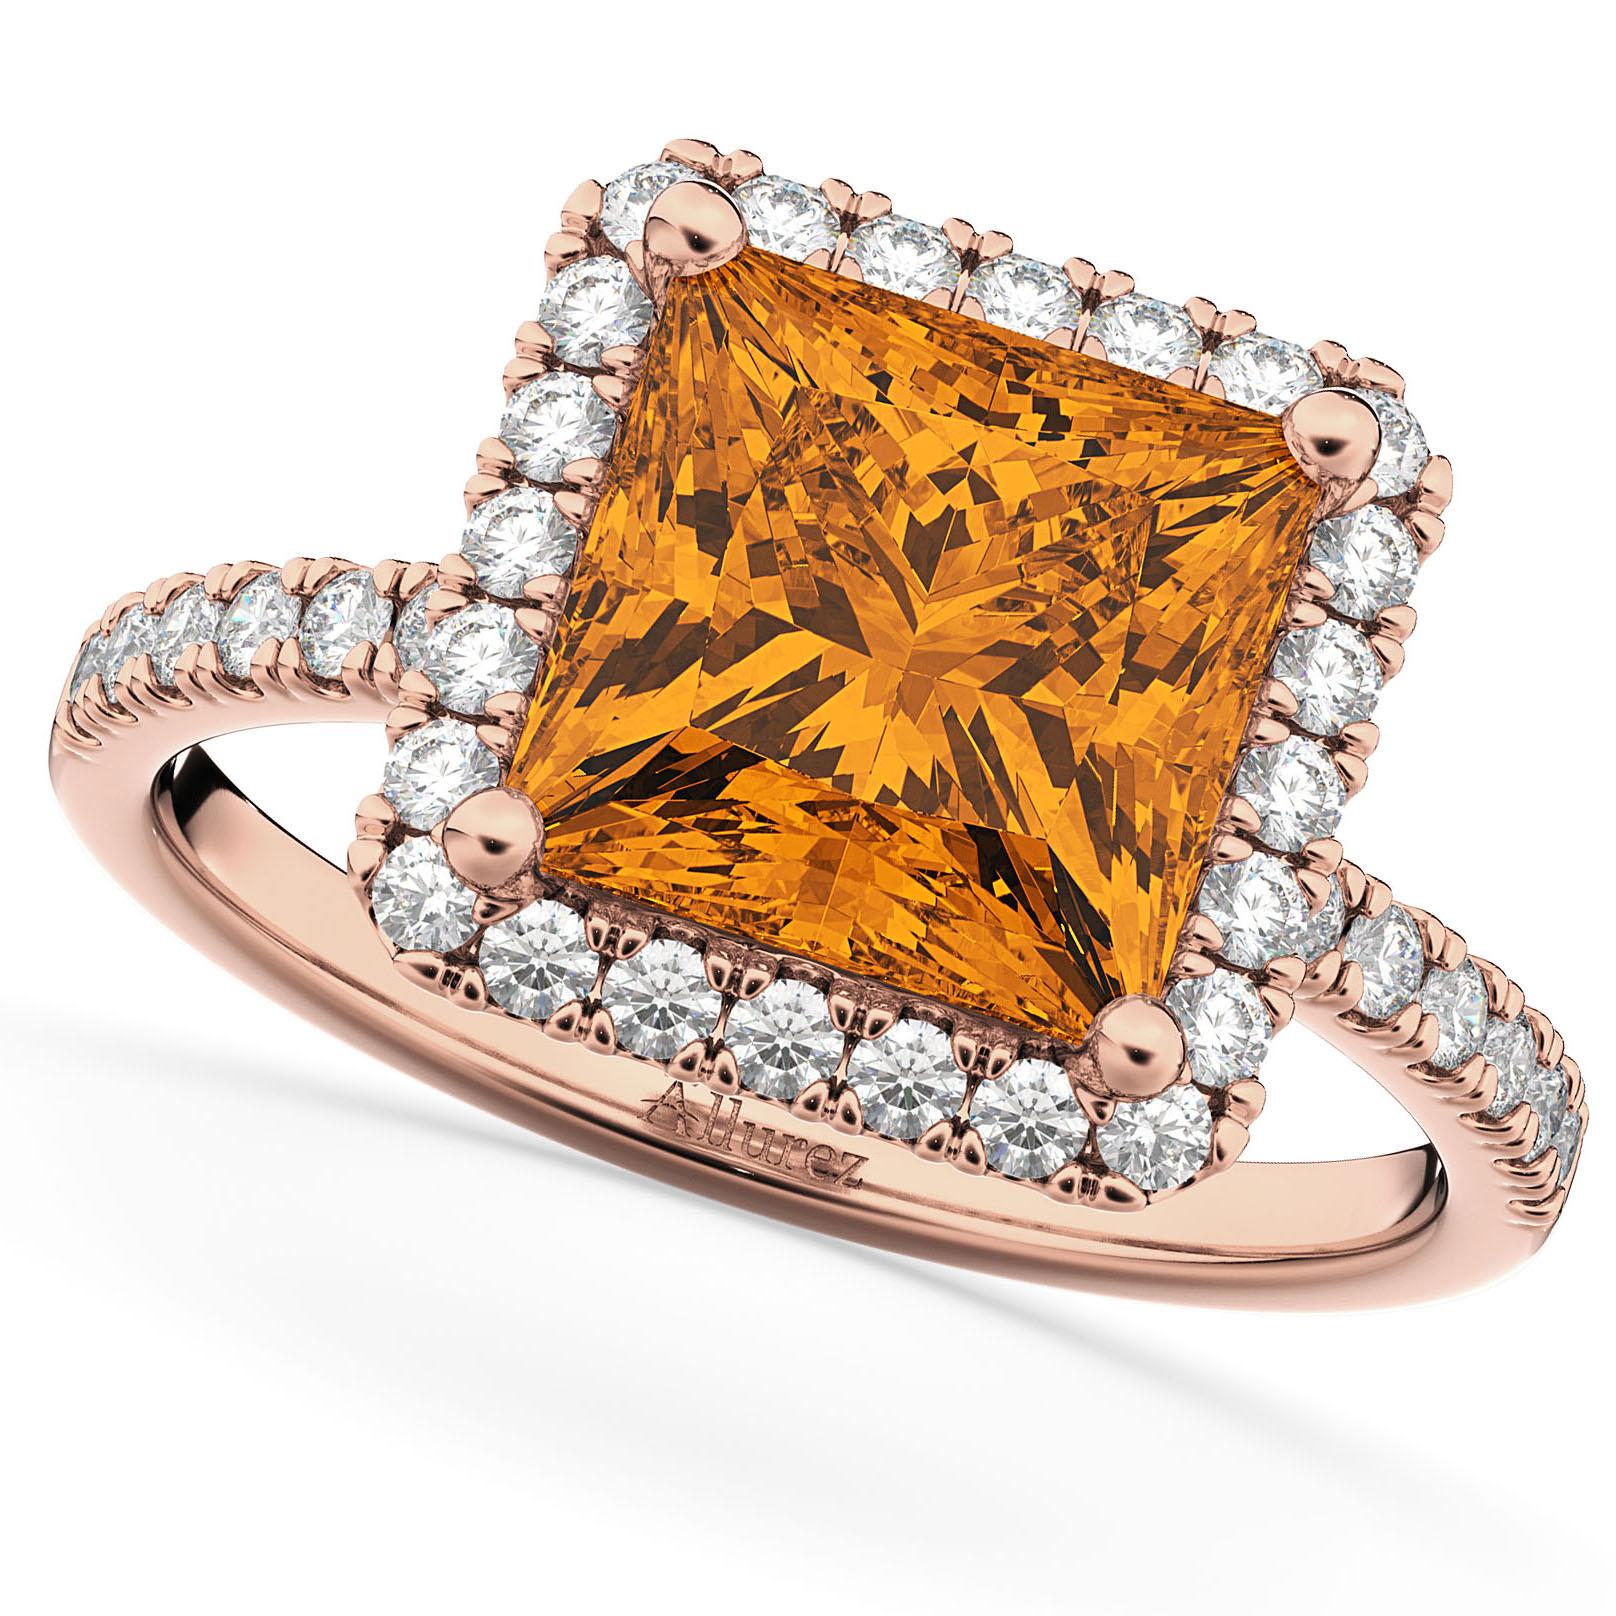 Princess Cut Halo Citrine & Diamond Engagement Ring 14K Rose Gold 3.47ct